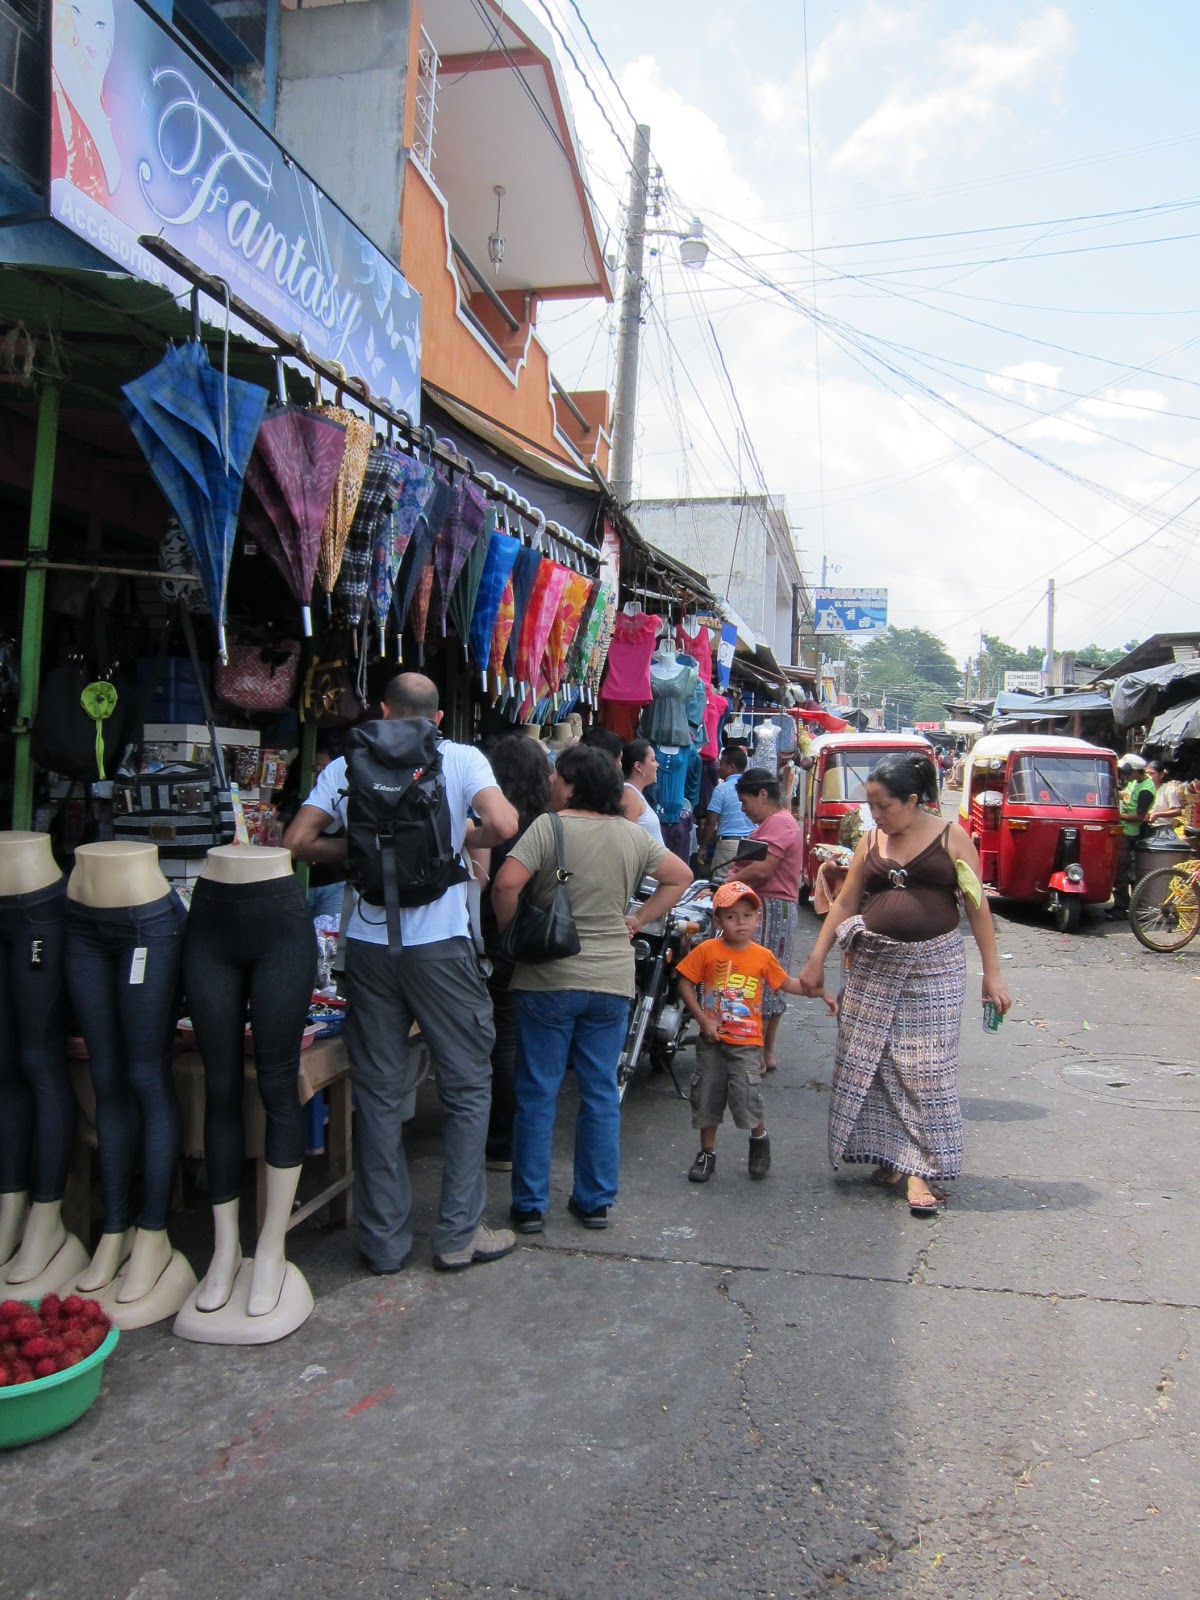 Claudia de guatemala bien cogida por un toro - 2 part 8